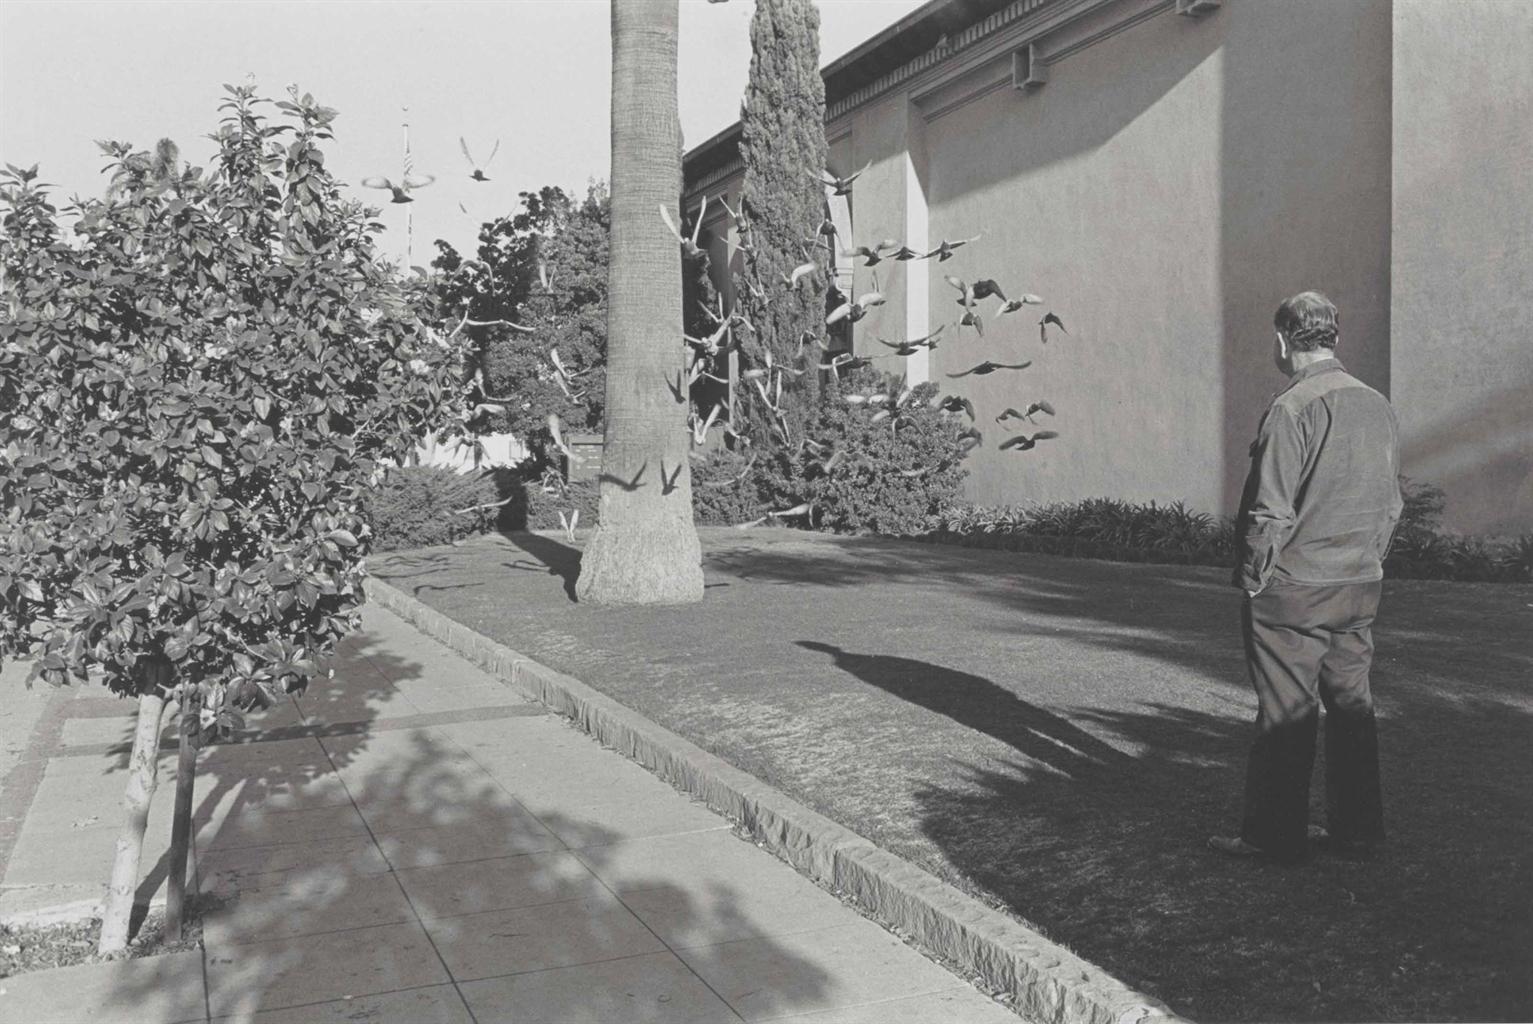 Henry Wessel-Santa Barbara, California-1977